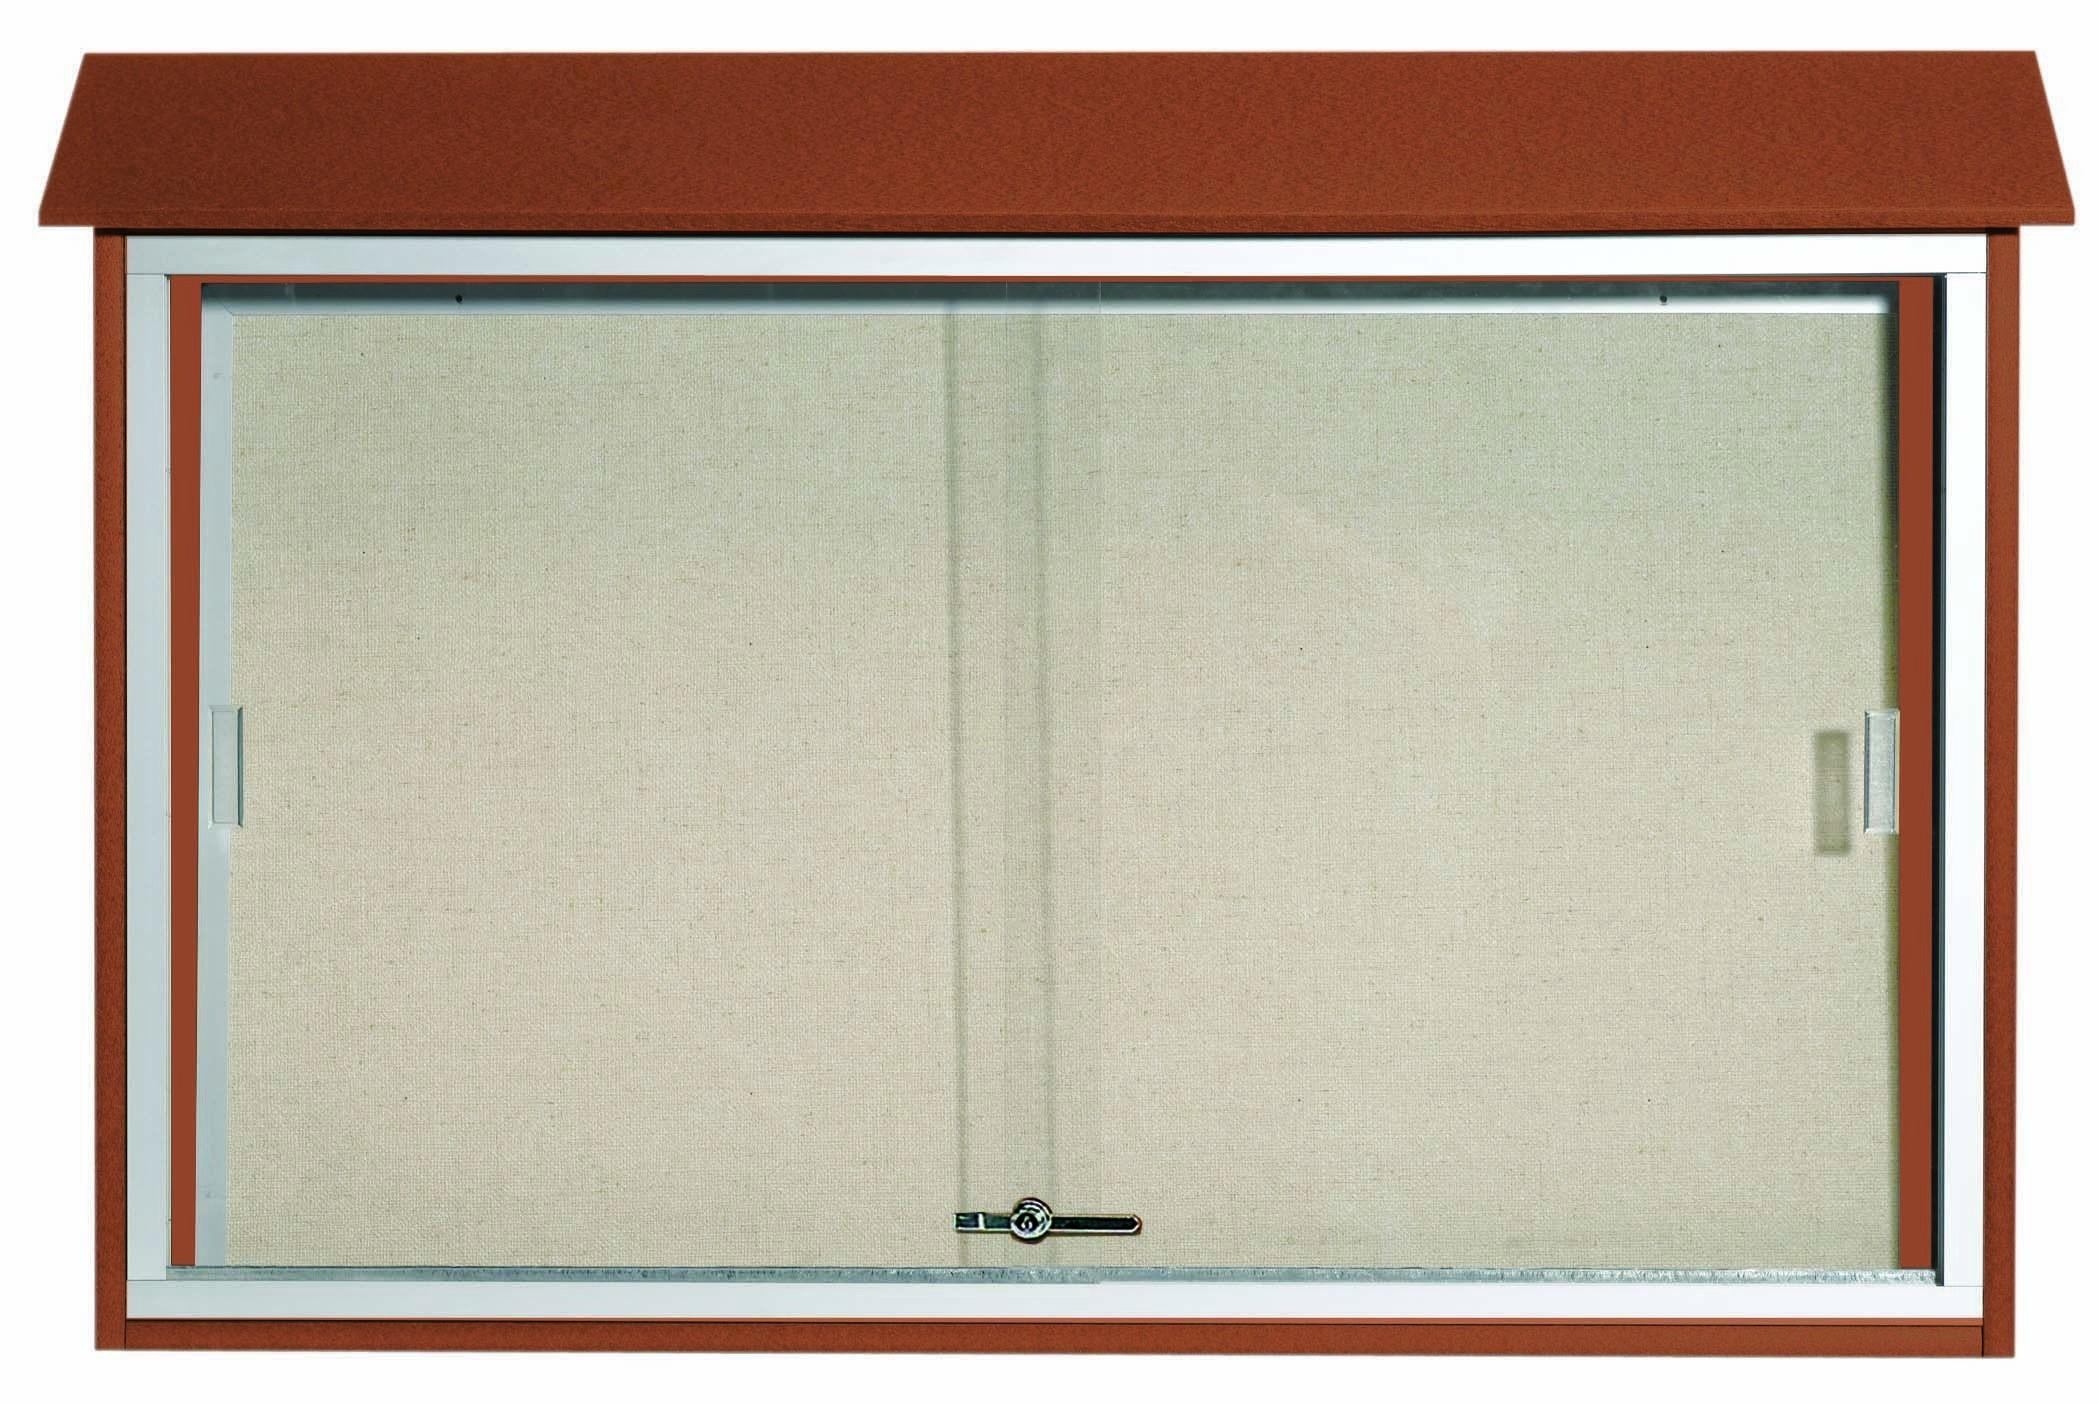 Cedar Sliding Door Plastic Lumber Message Center with Vinyl Posting Surface- 30